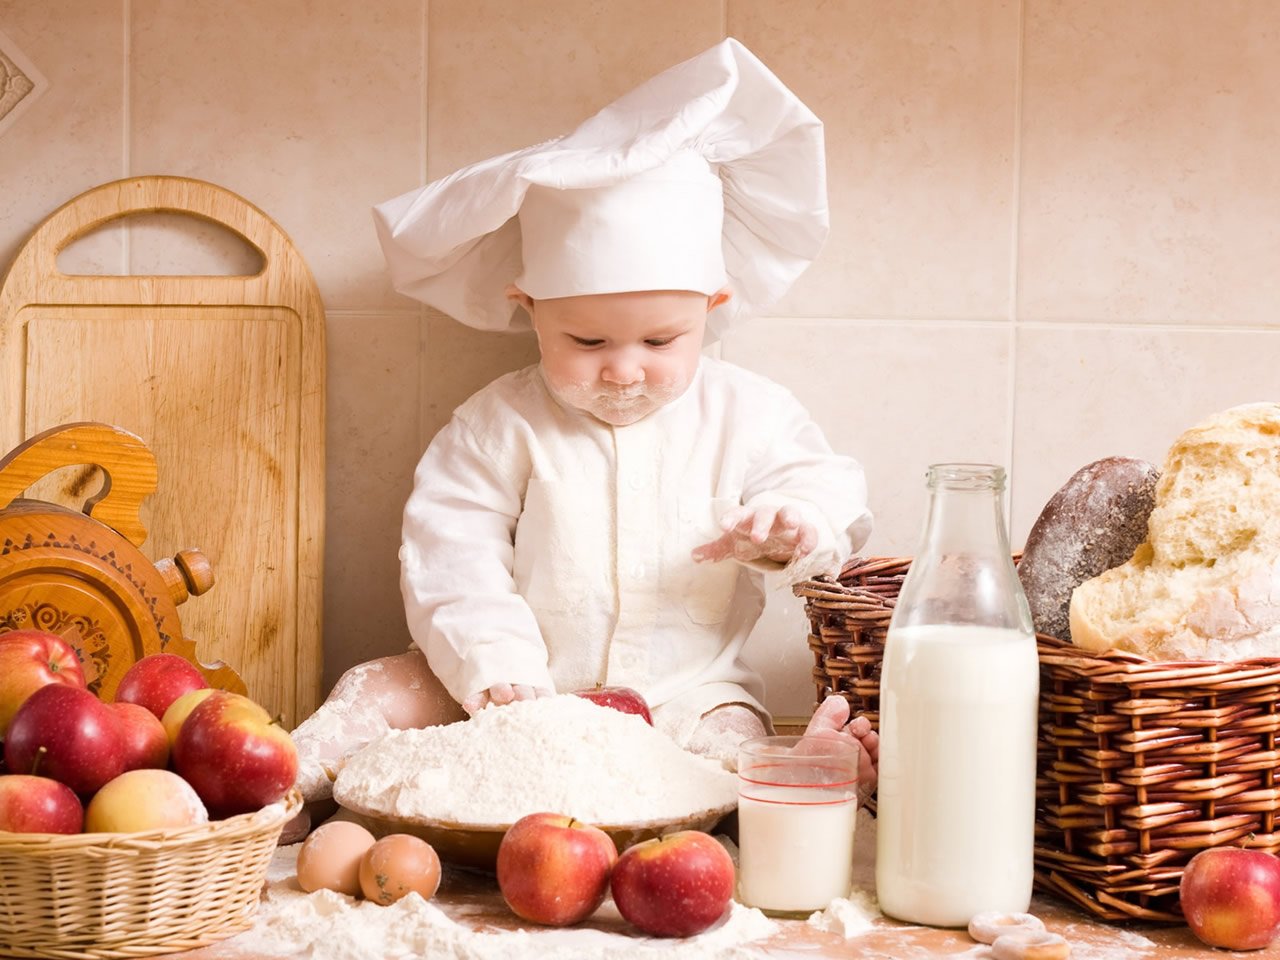 http://4.bp.blogspot.com/-cGYyFCMtTIc/TwUFgcgfsmI/AAAAAAAACdc/nlp1lA3a404/s1600/Kids-Wallpapers-Sweet-Baby-Wallpaper.jpg